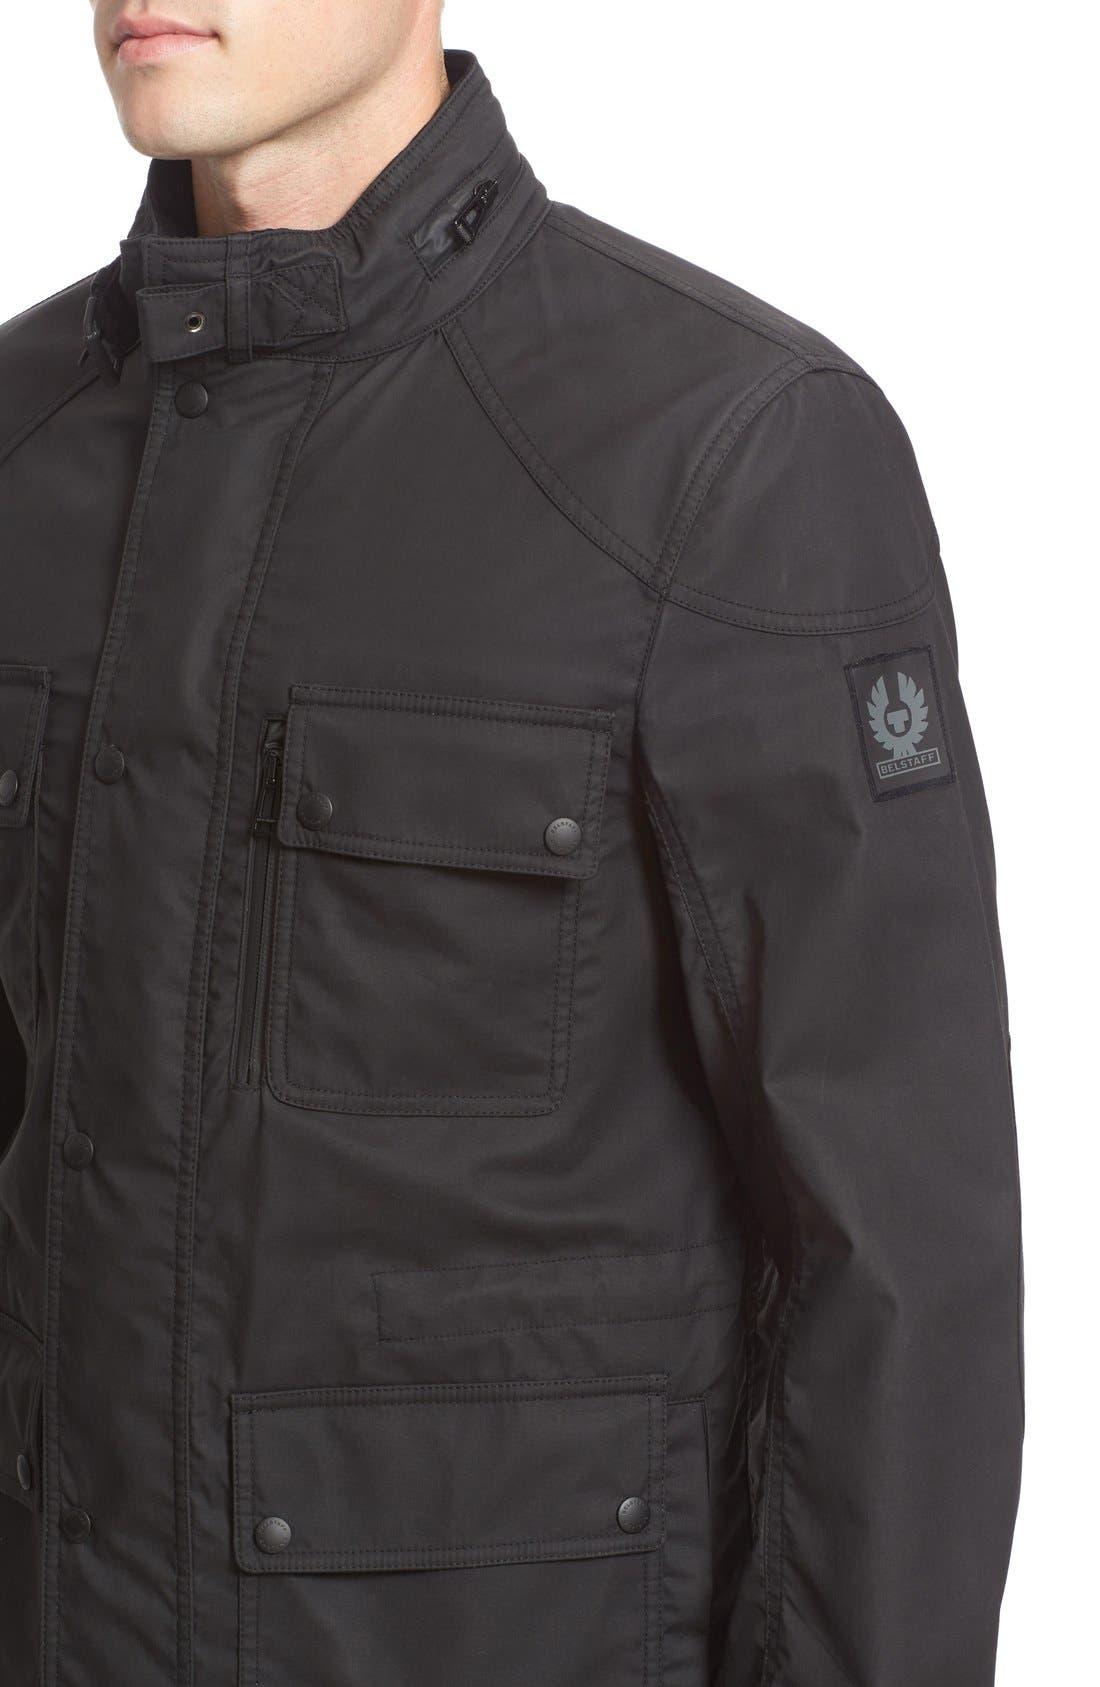 BELSTAFF,                             Trailmaster Staywax Jacket,                             Alternate thumbnail 6, color,                             001